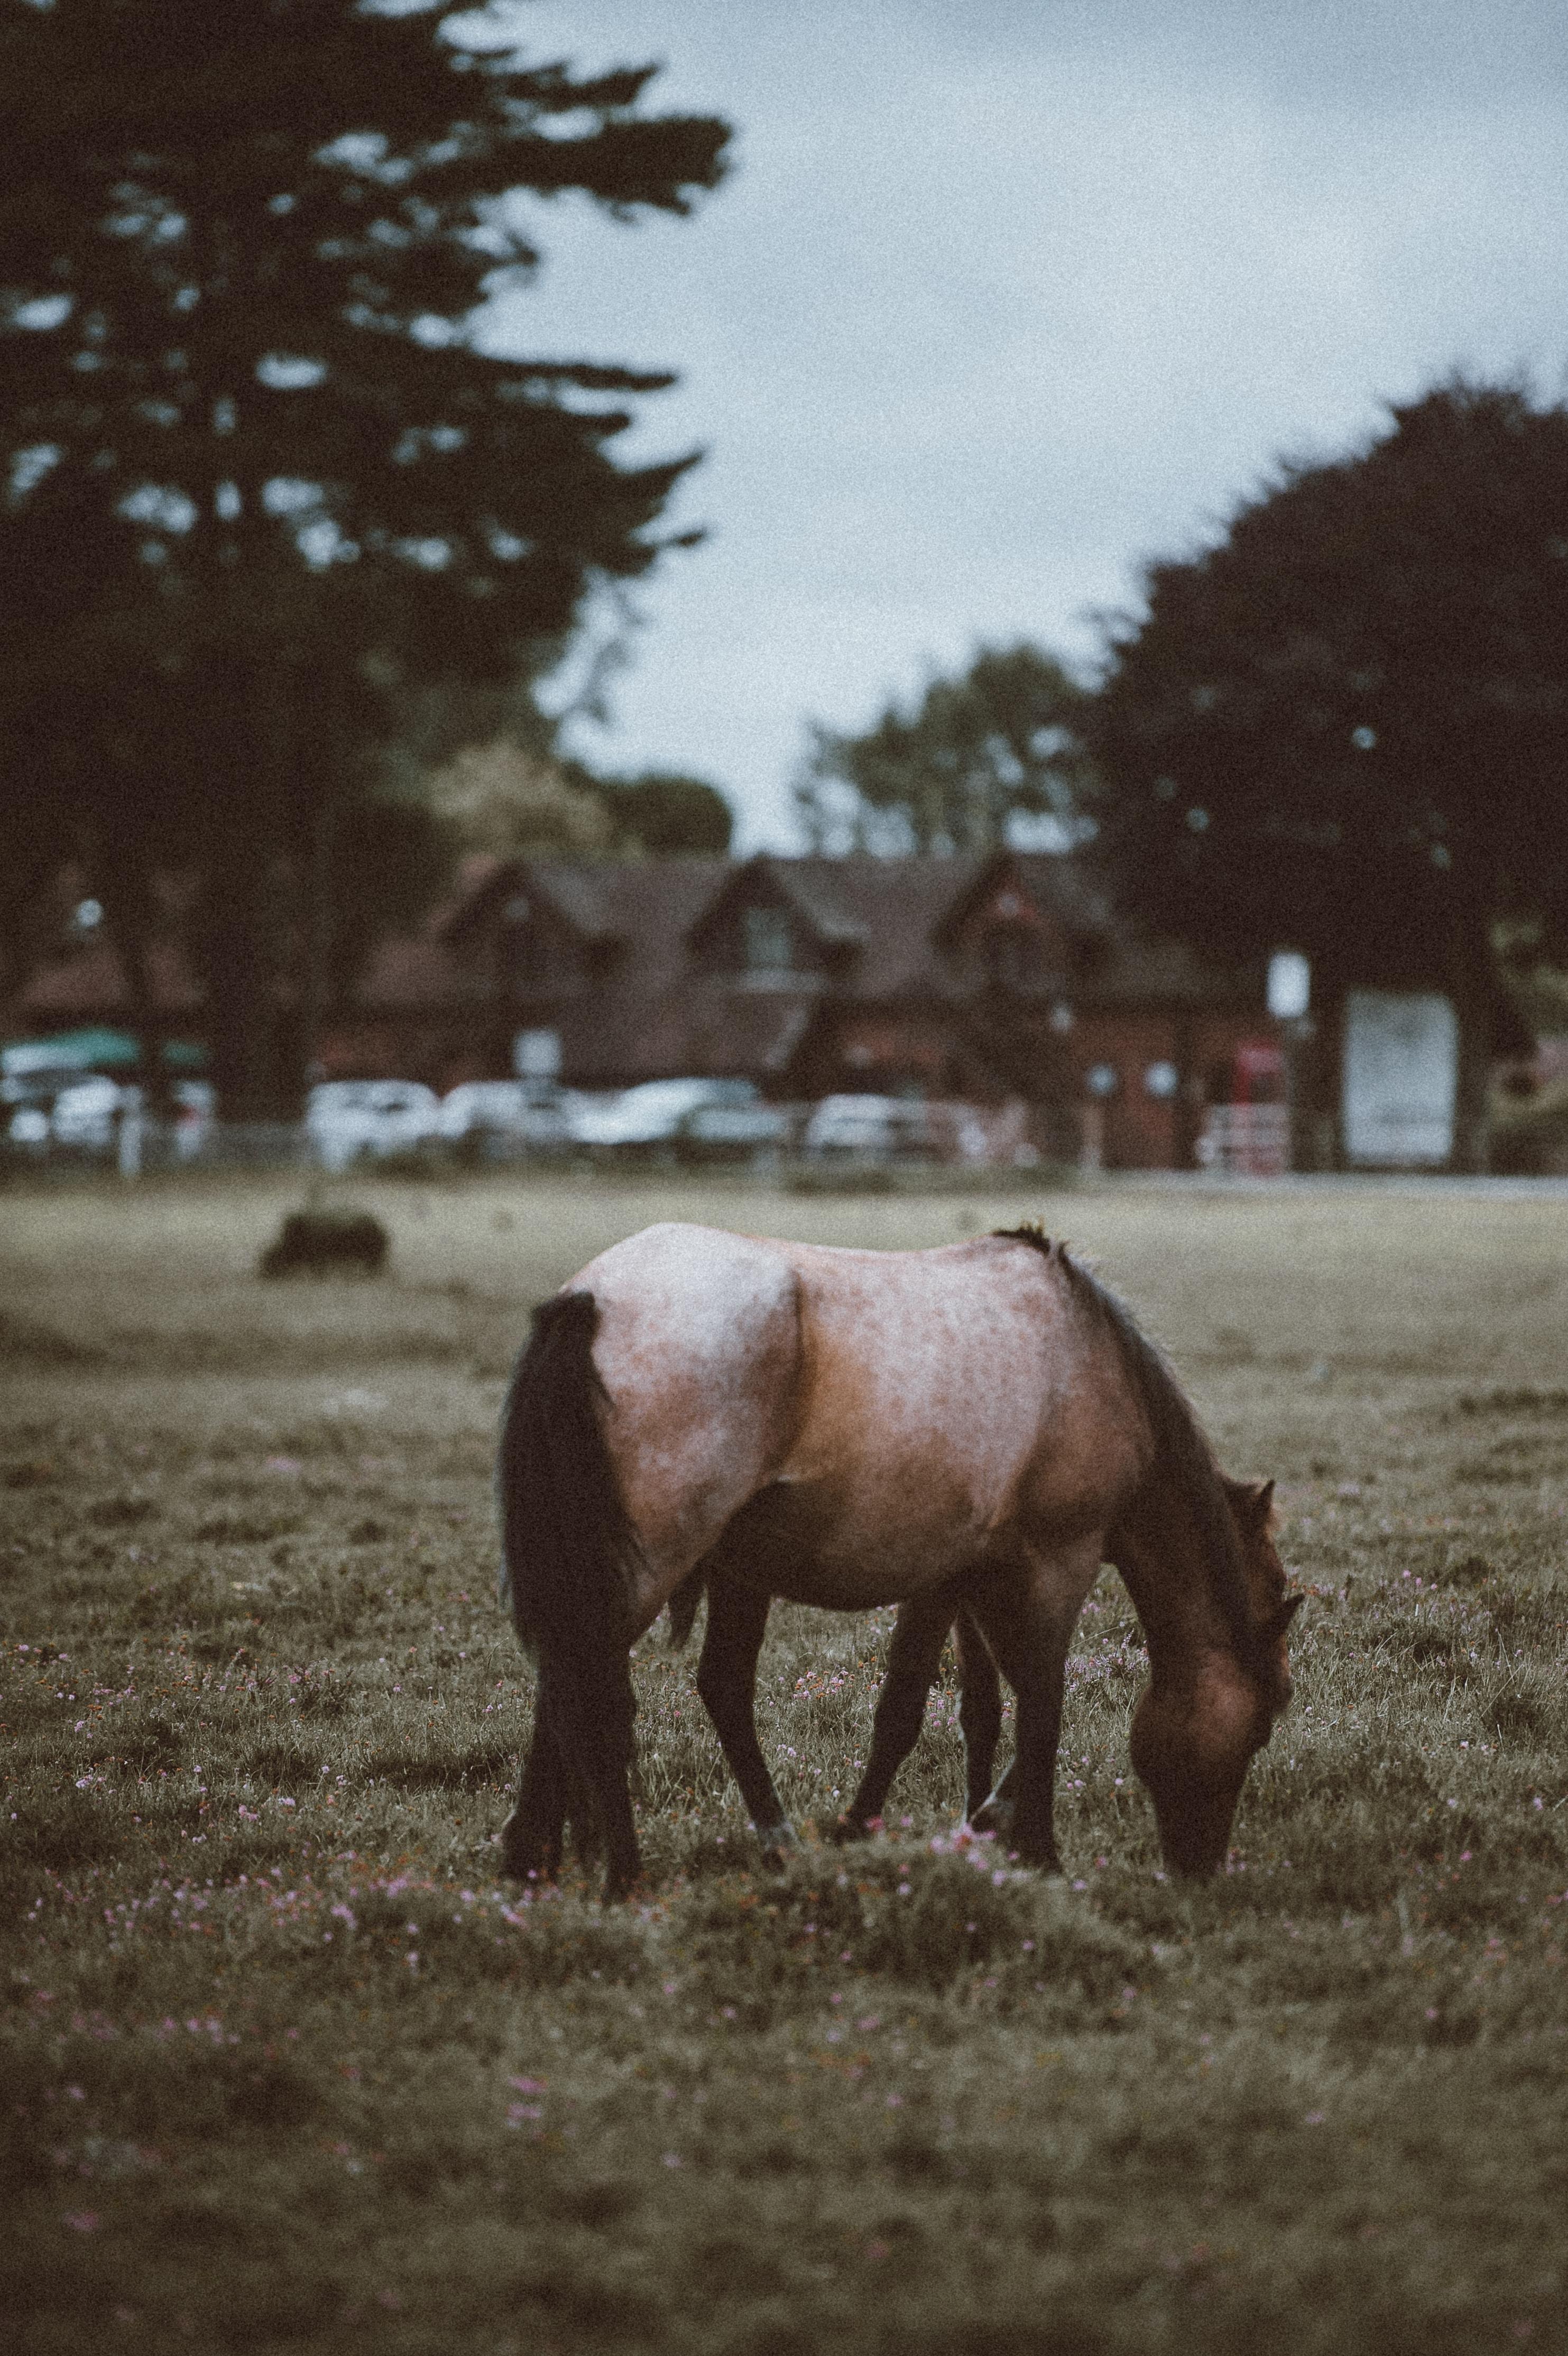 horse eating grasse